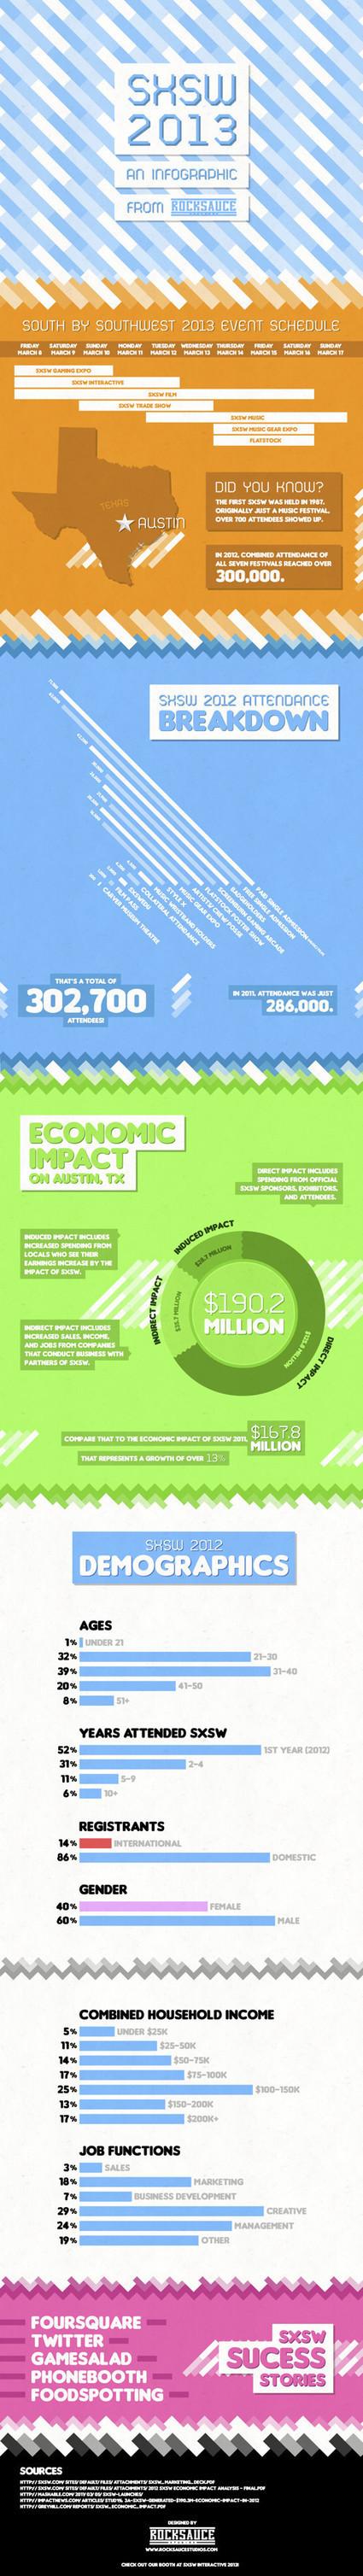 SXSW 2013 [infographic] | World News Scoop | Scoop.it